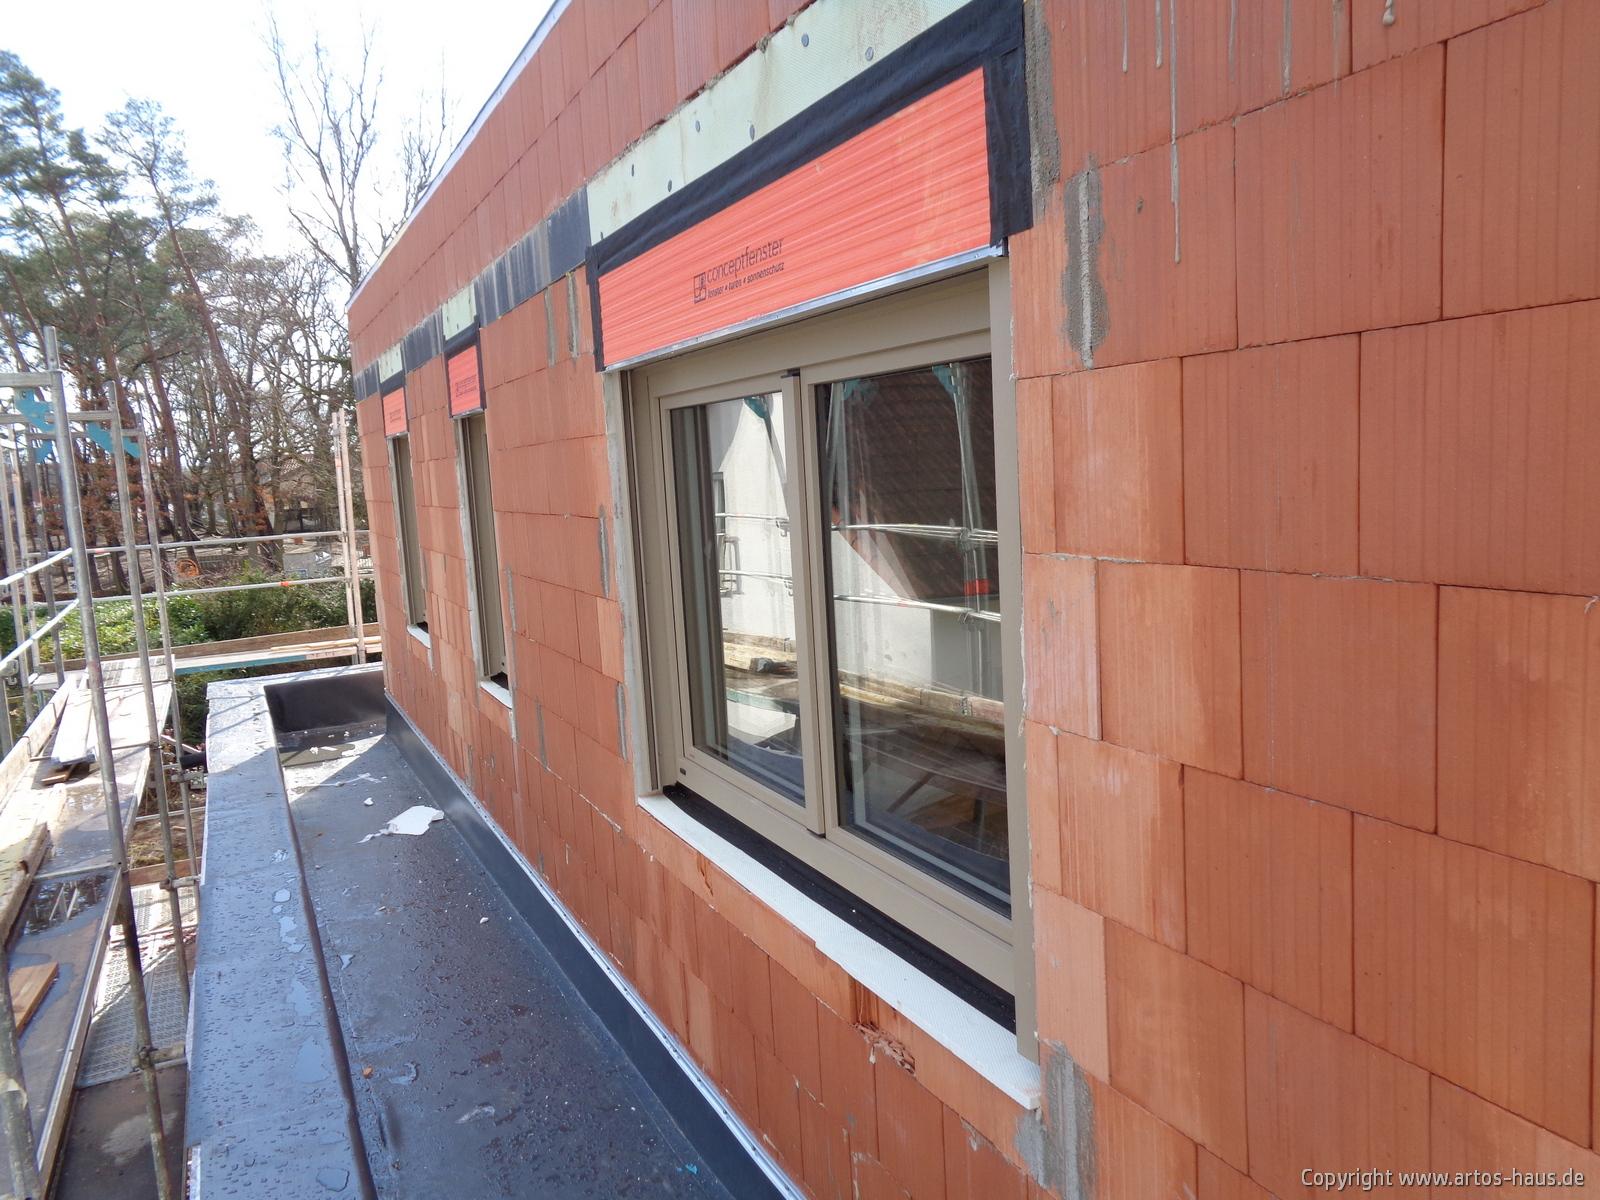 Fenstereinbau ARTOS HAUS 2021, Bild 4